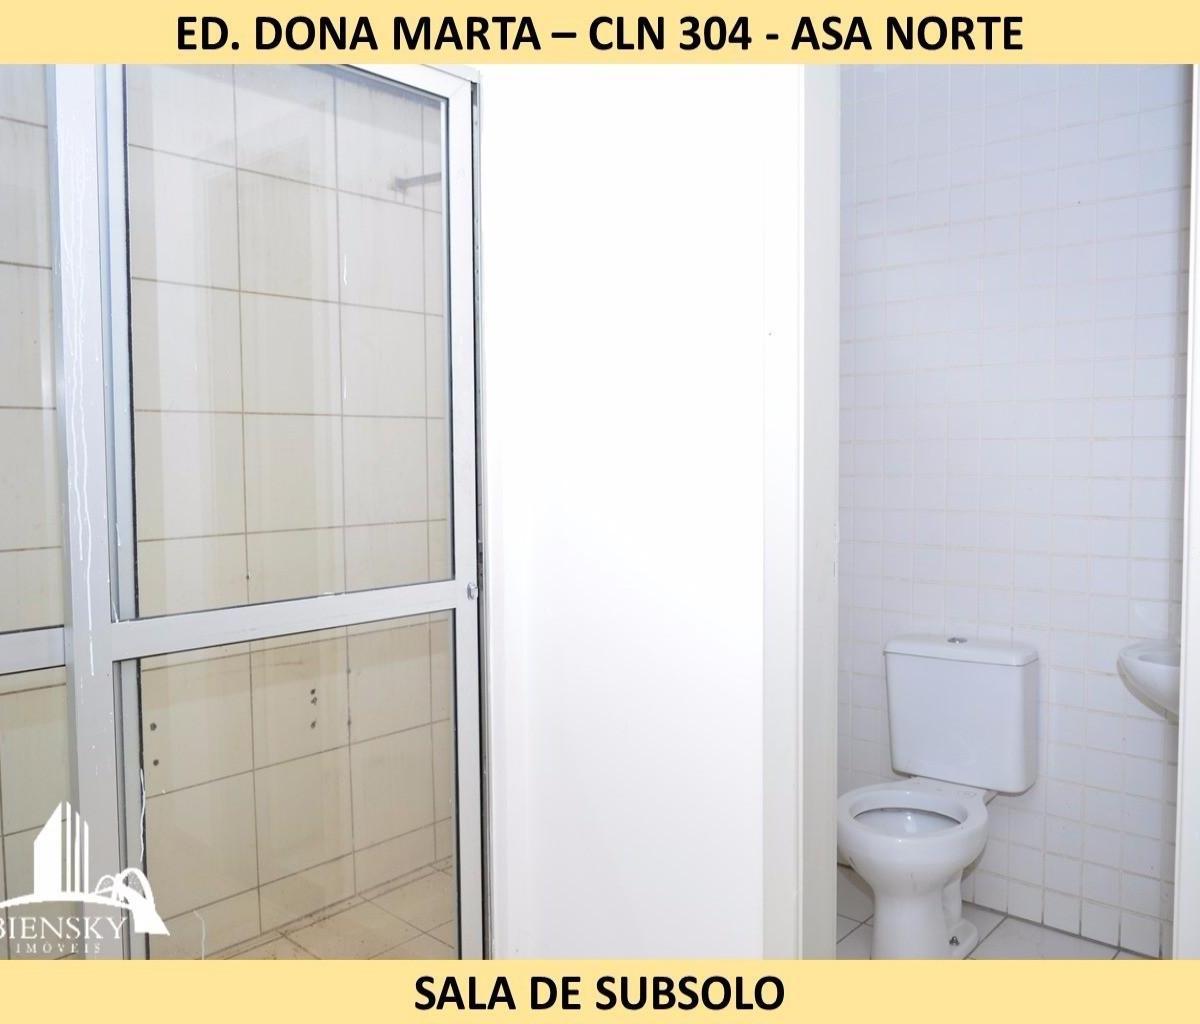 Imagens de #A38728 cln 304 bloco d loja de subsolo cln 304 bloco d asa norte brasília 1200x1024 px 3346 Bloco De Cad Banheiro Publico